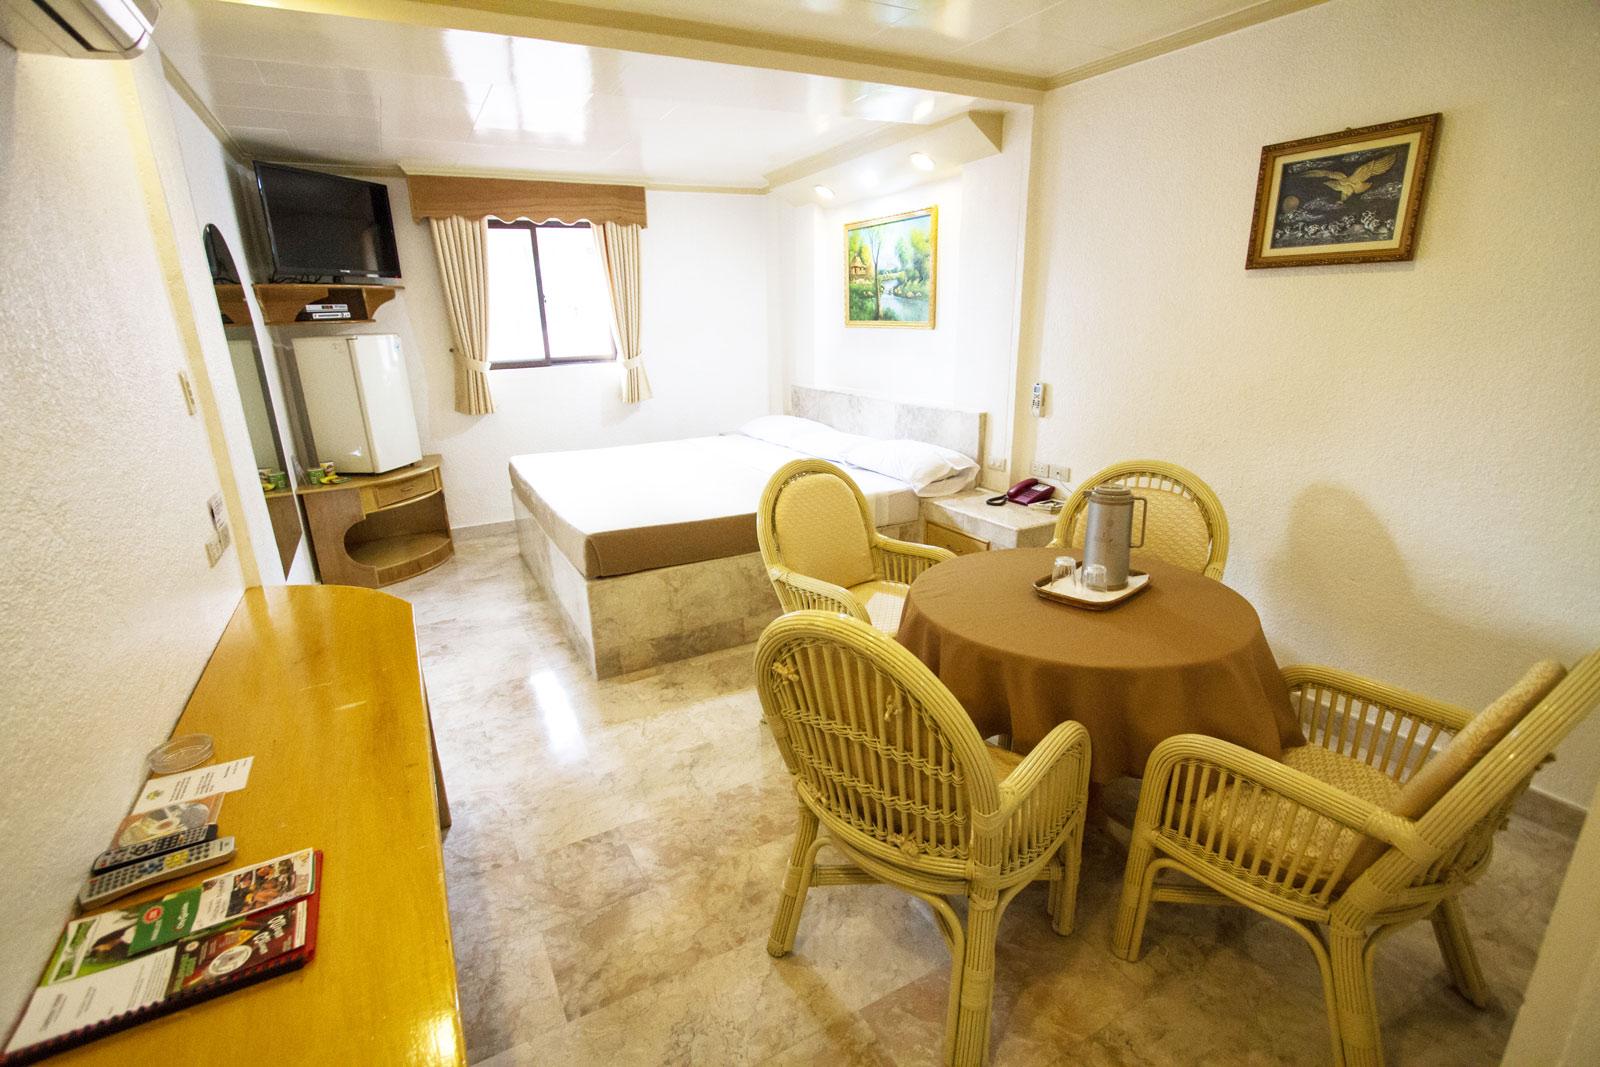 Clarkton Hotel Angeles King Suite 4